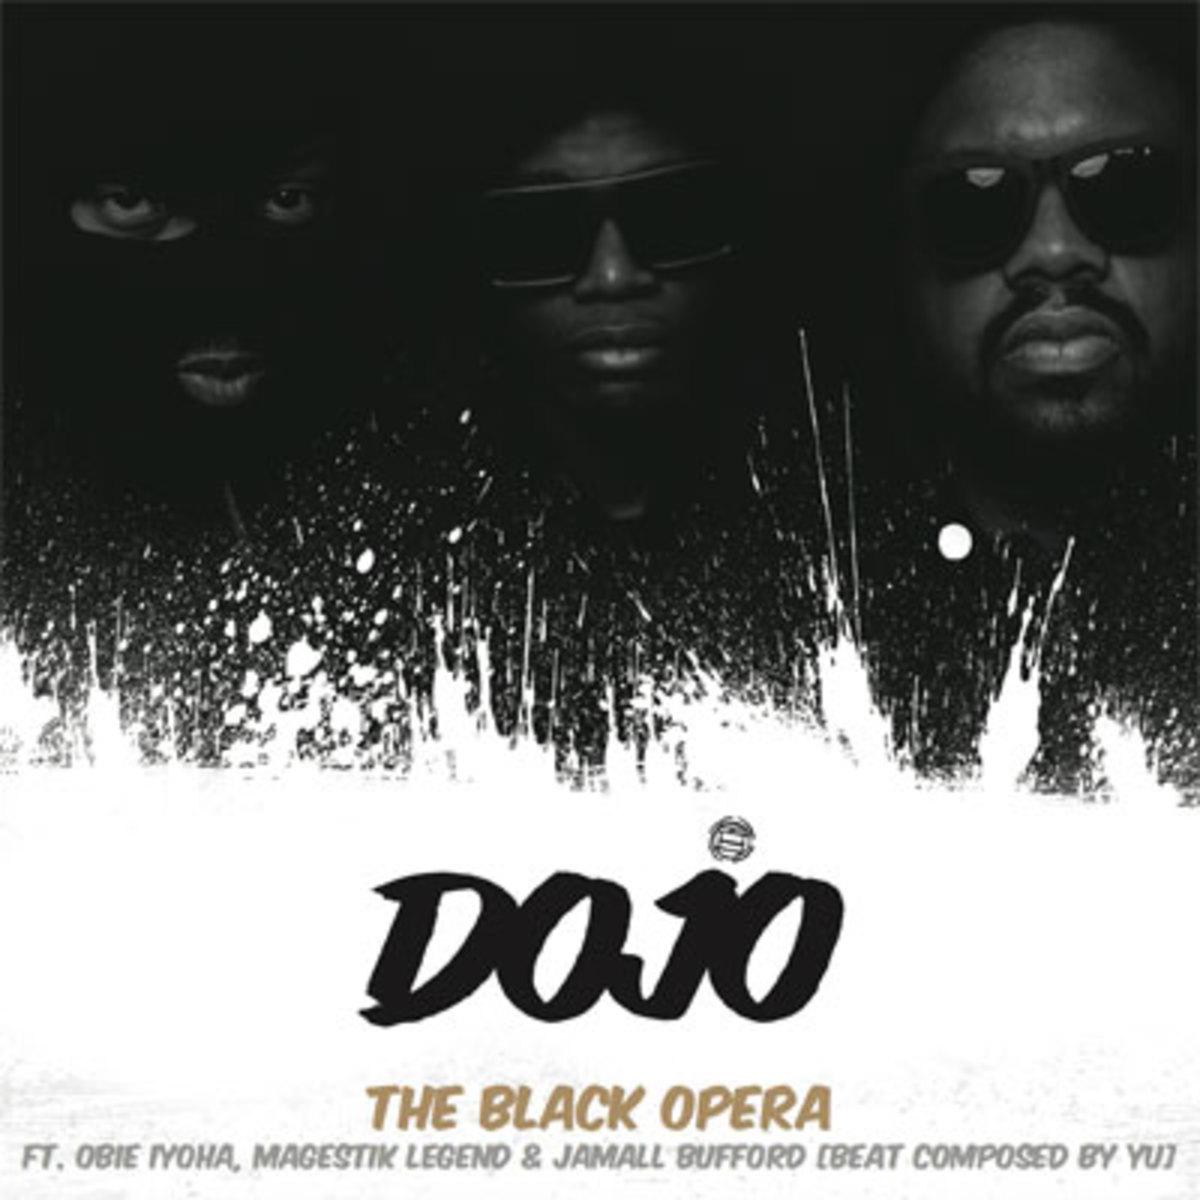 theblackopera-dojo.jpg